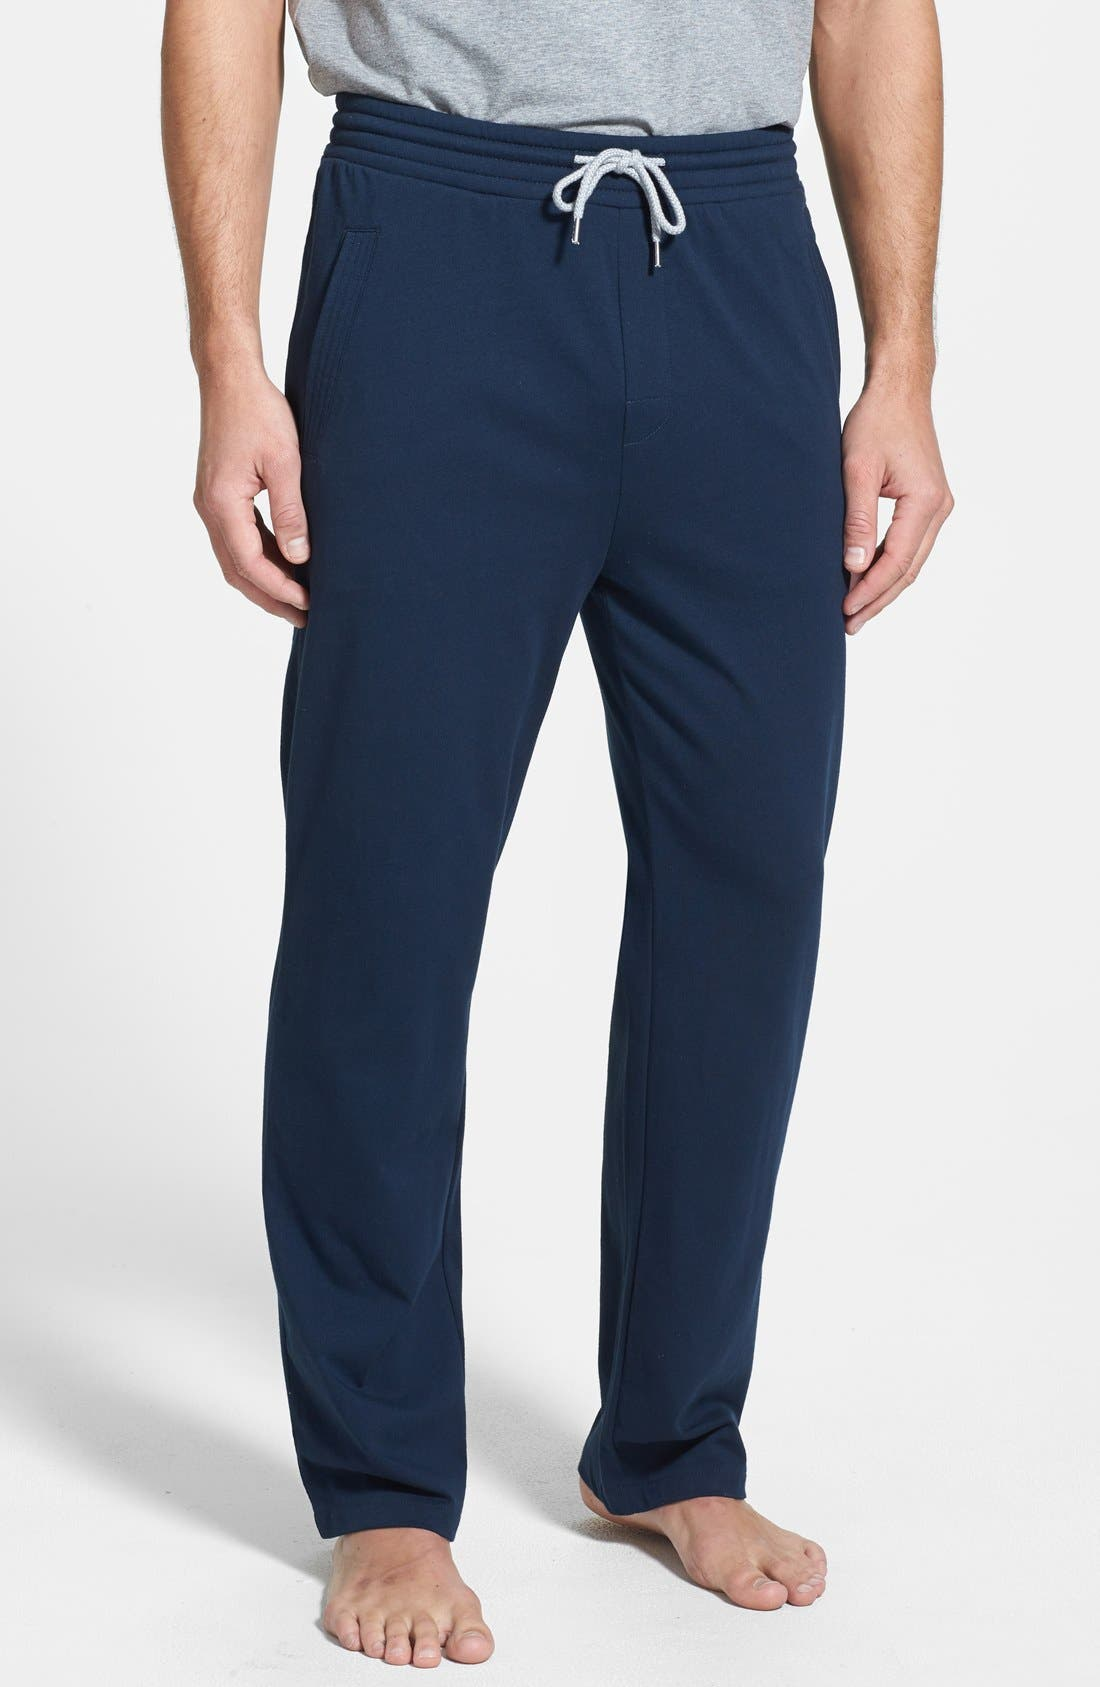 Main Image - BOSS HUGO BOSS 'Innovation 3' Lounge Pants